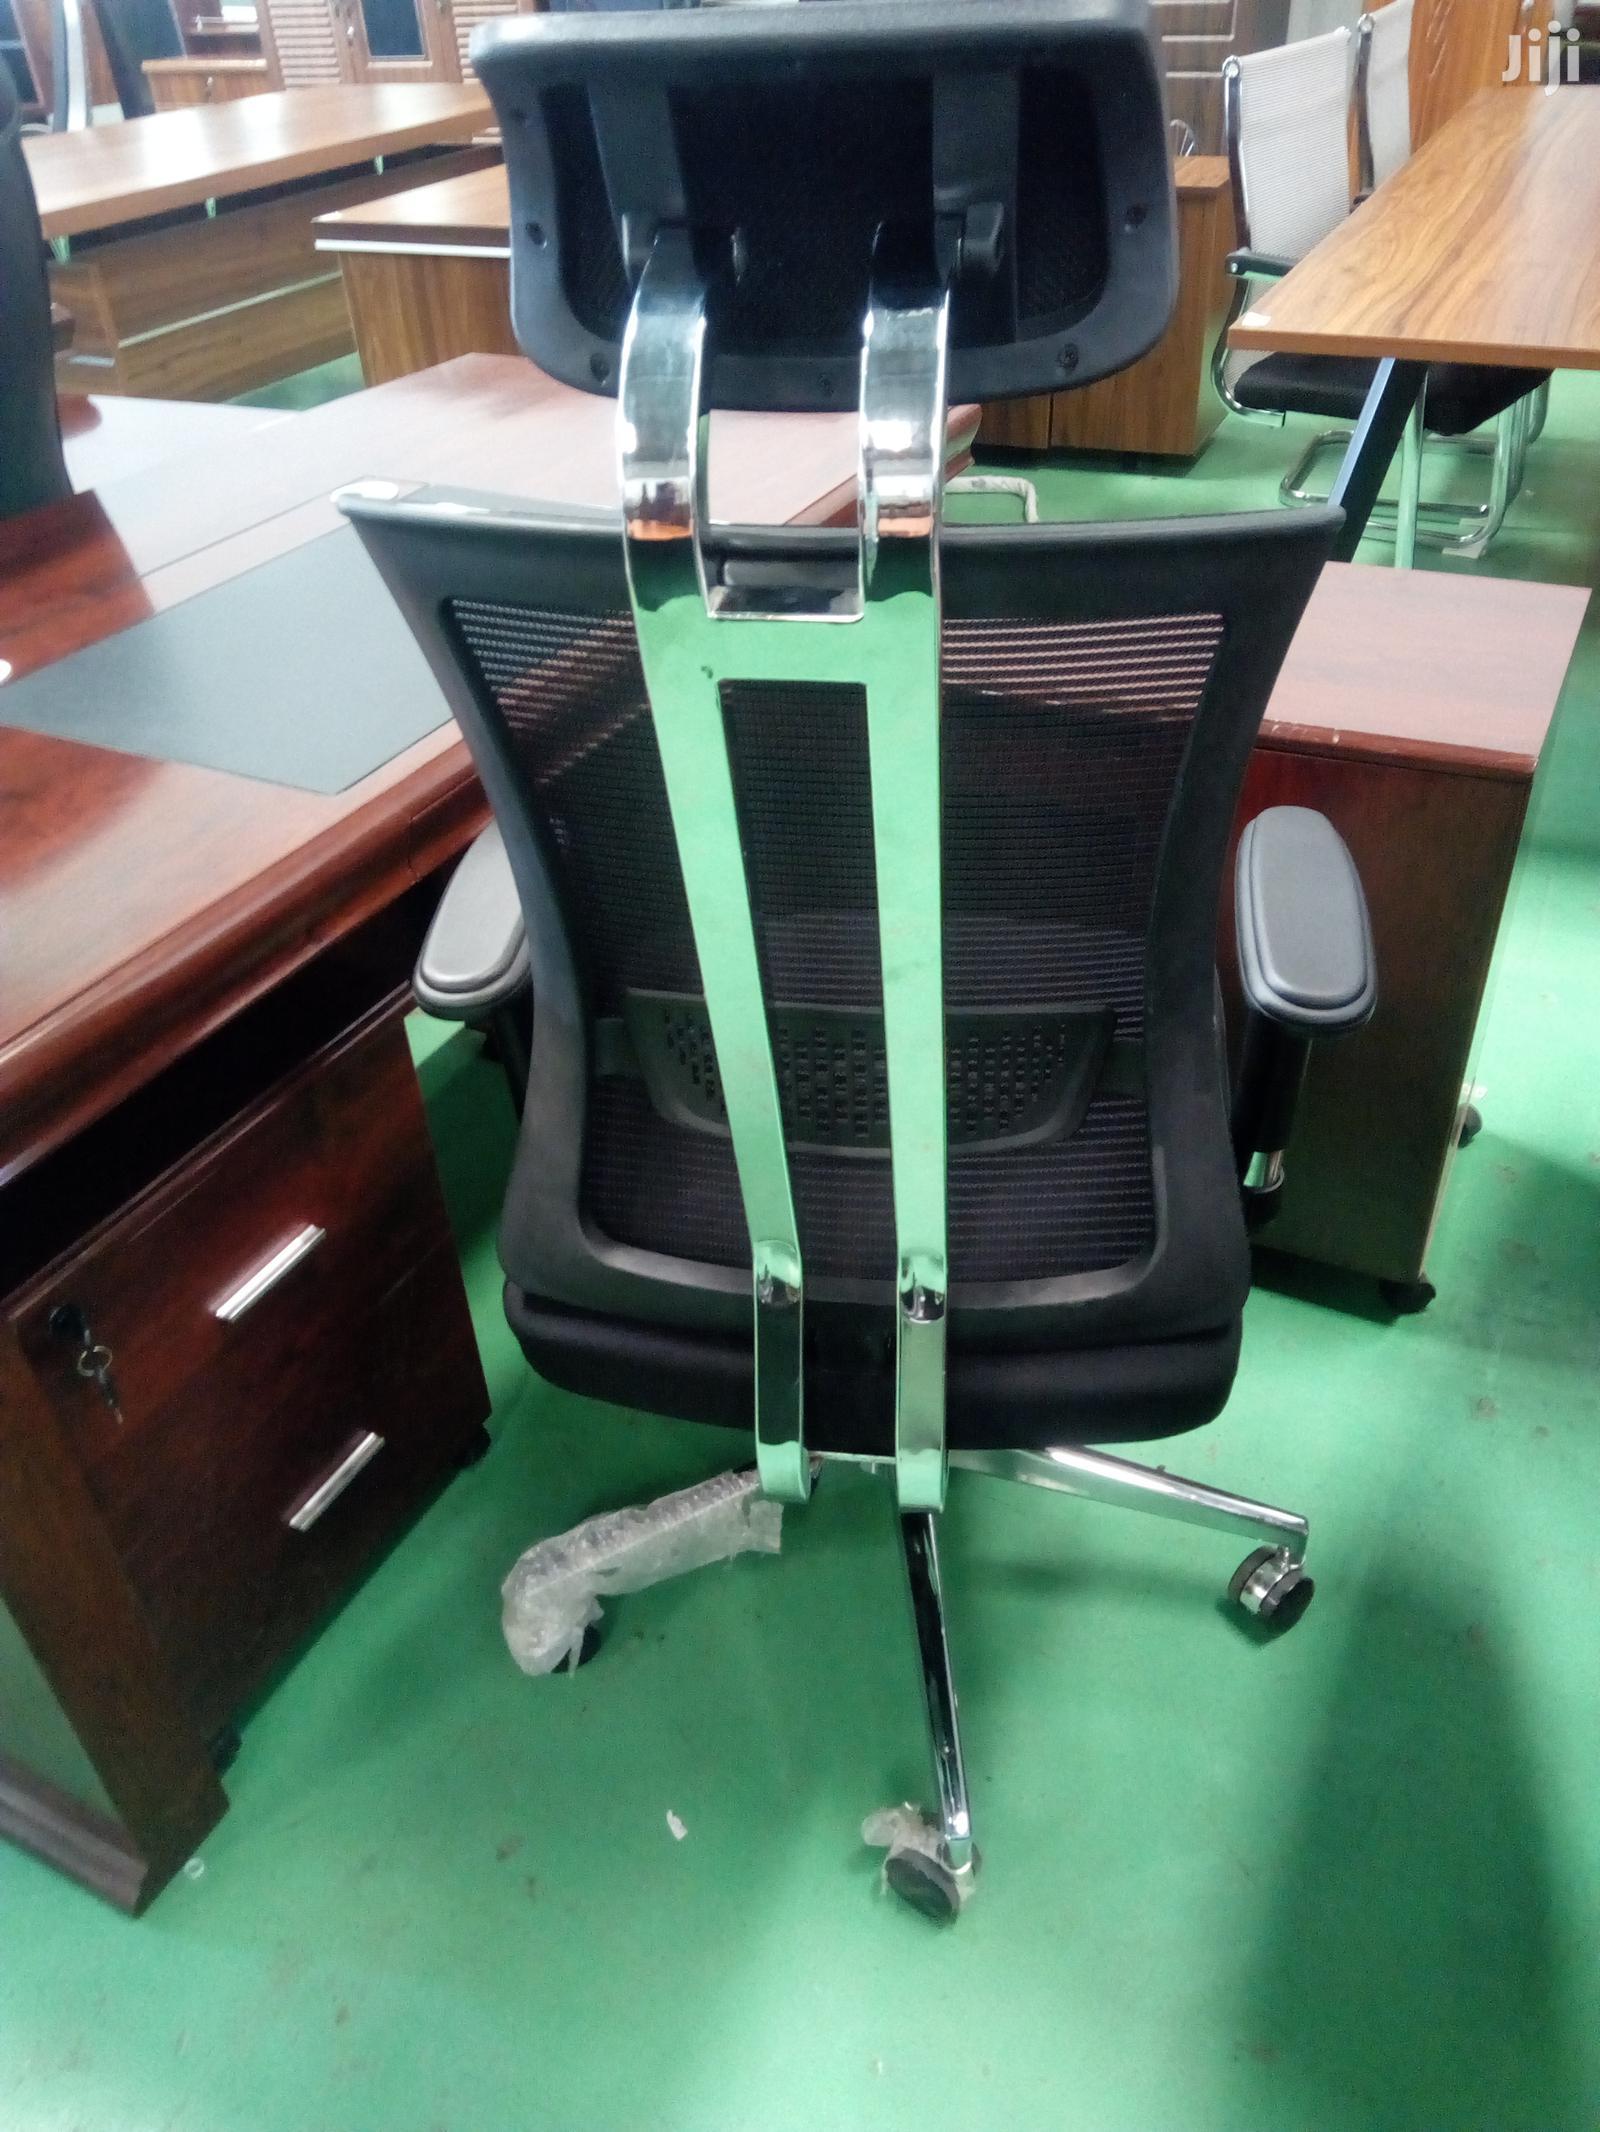 Orthopaedic Office Chair | Furniture for sale in Nairobi South, Nairobi, Kenya